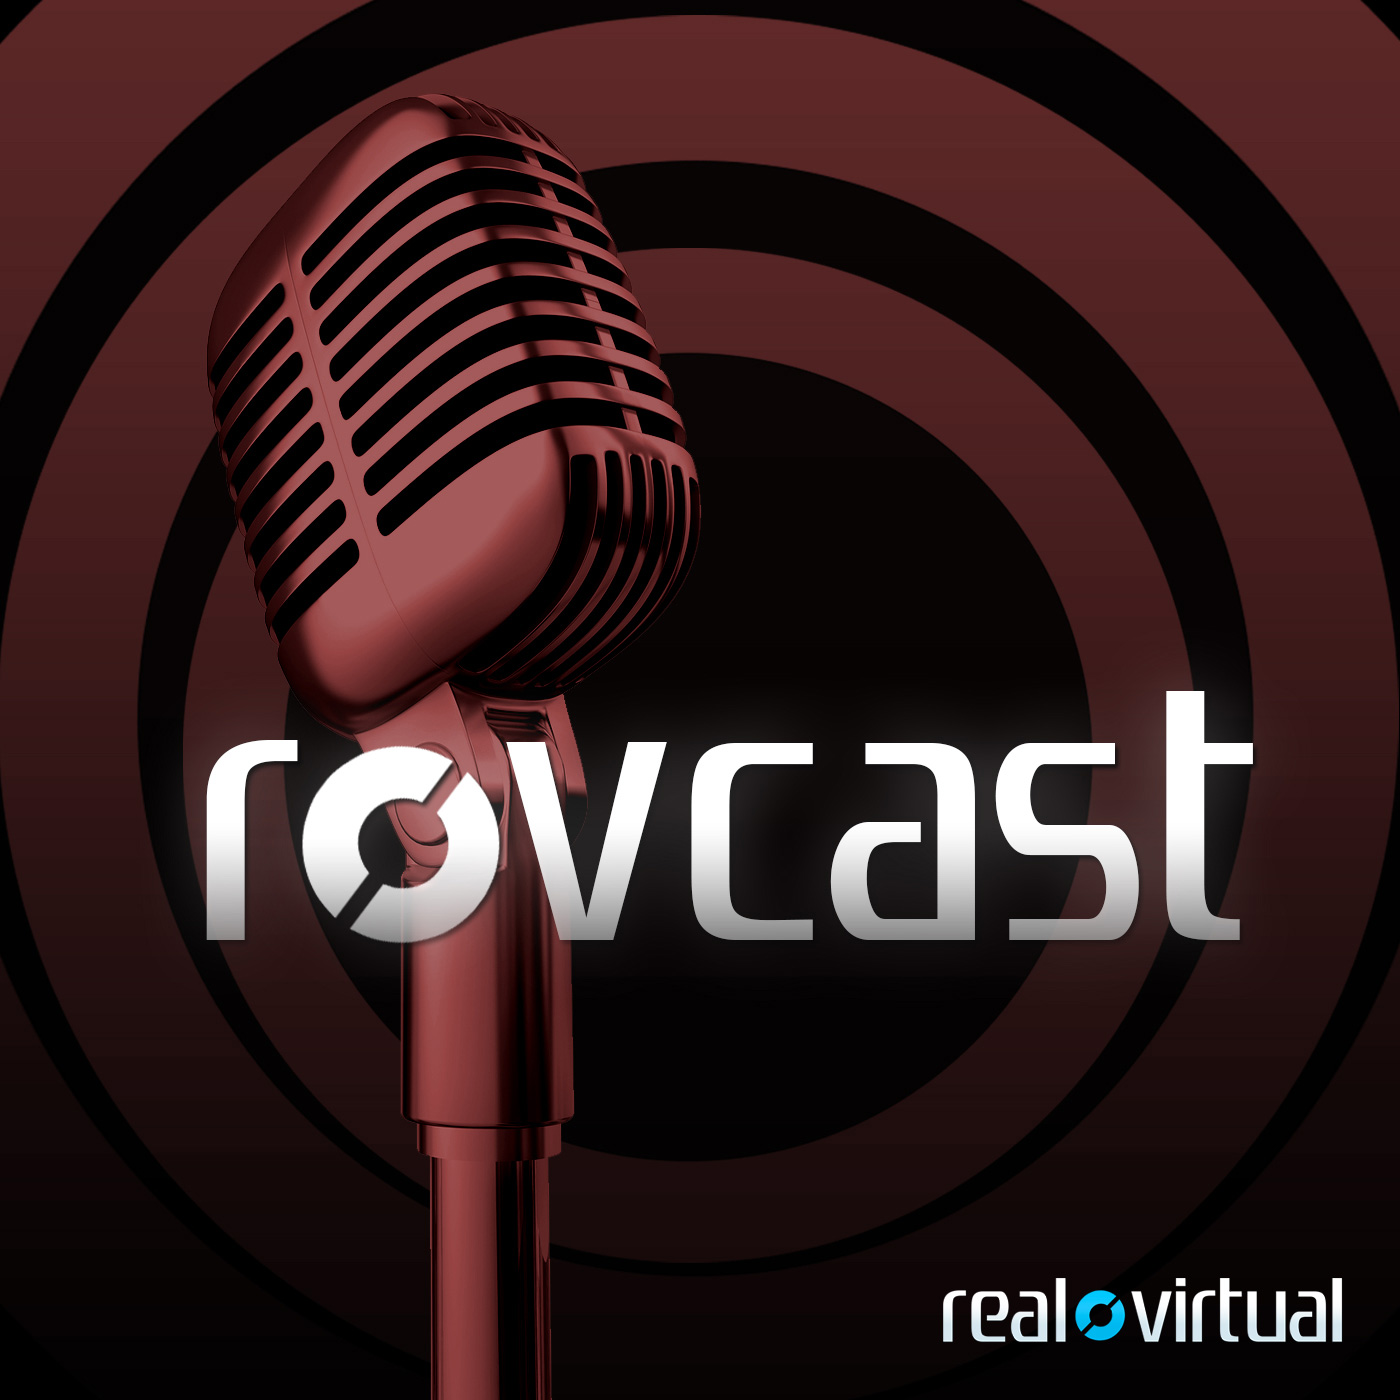 ROVCAST - realovirtual